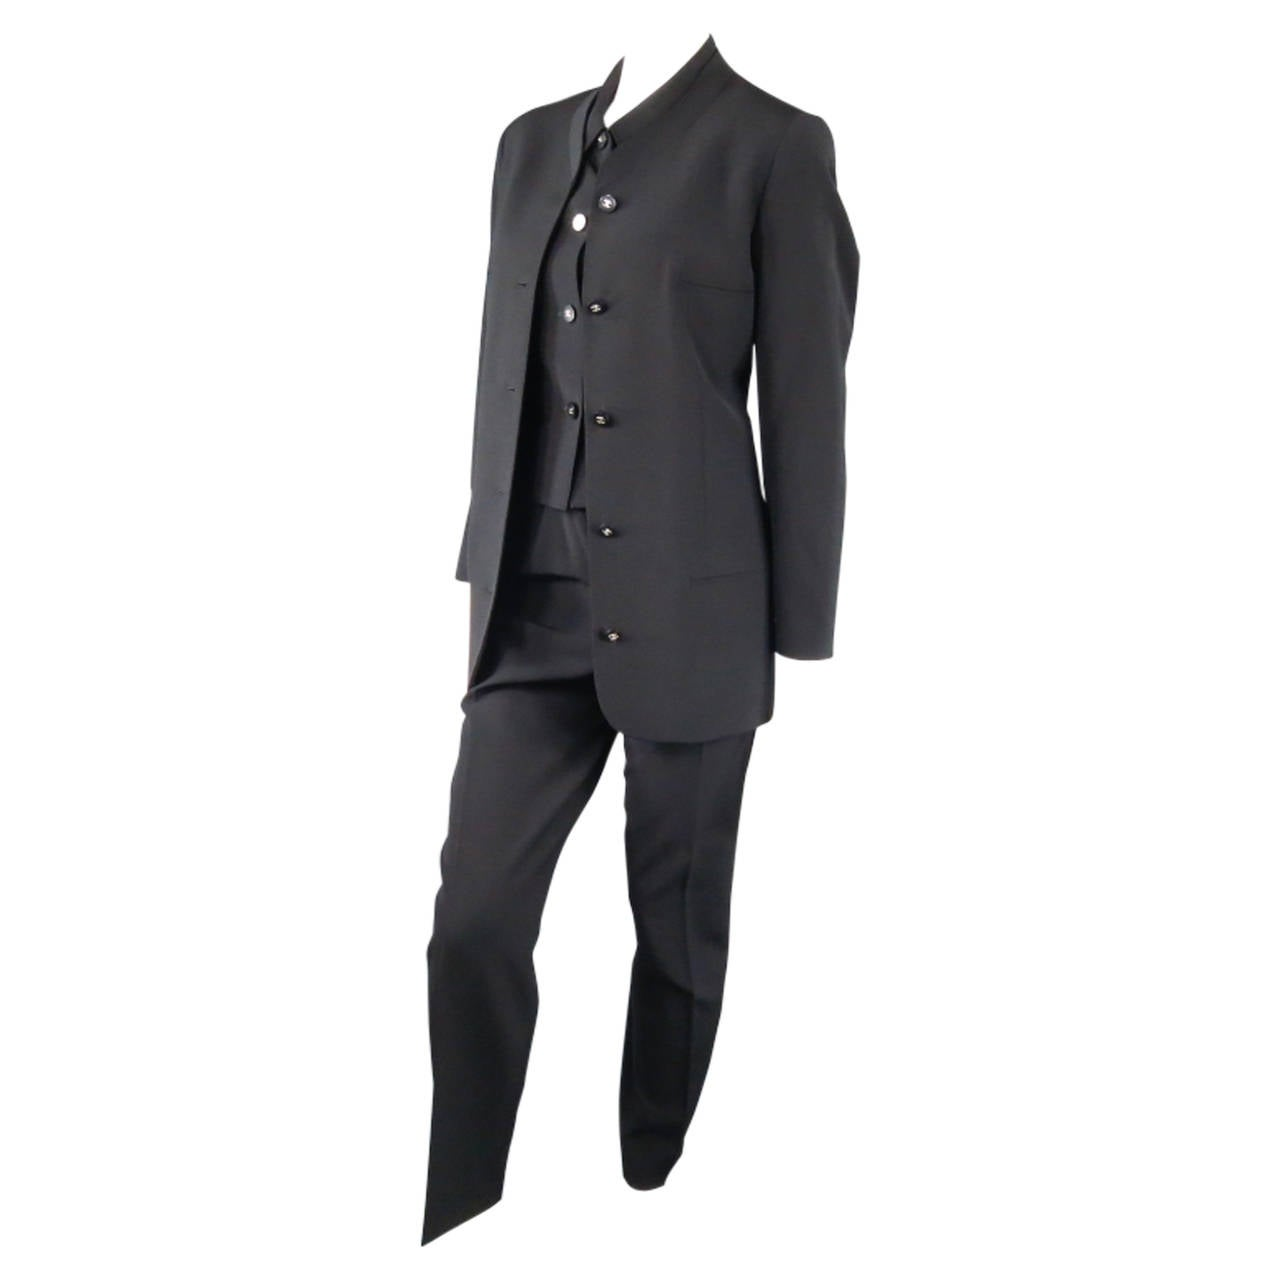 CHANEL Size 10 Black Wool 3 Piece Vest Pants Jacket Ensemble 1996 1